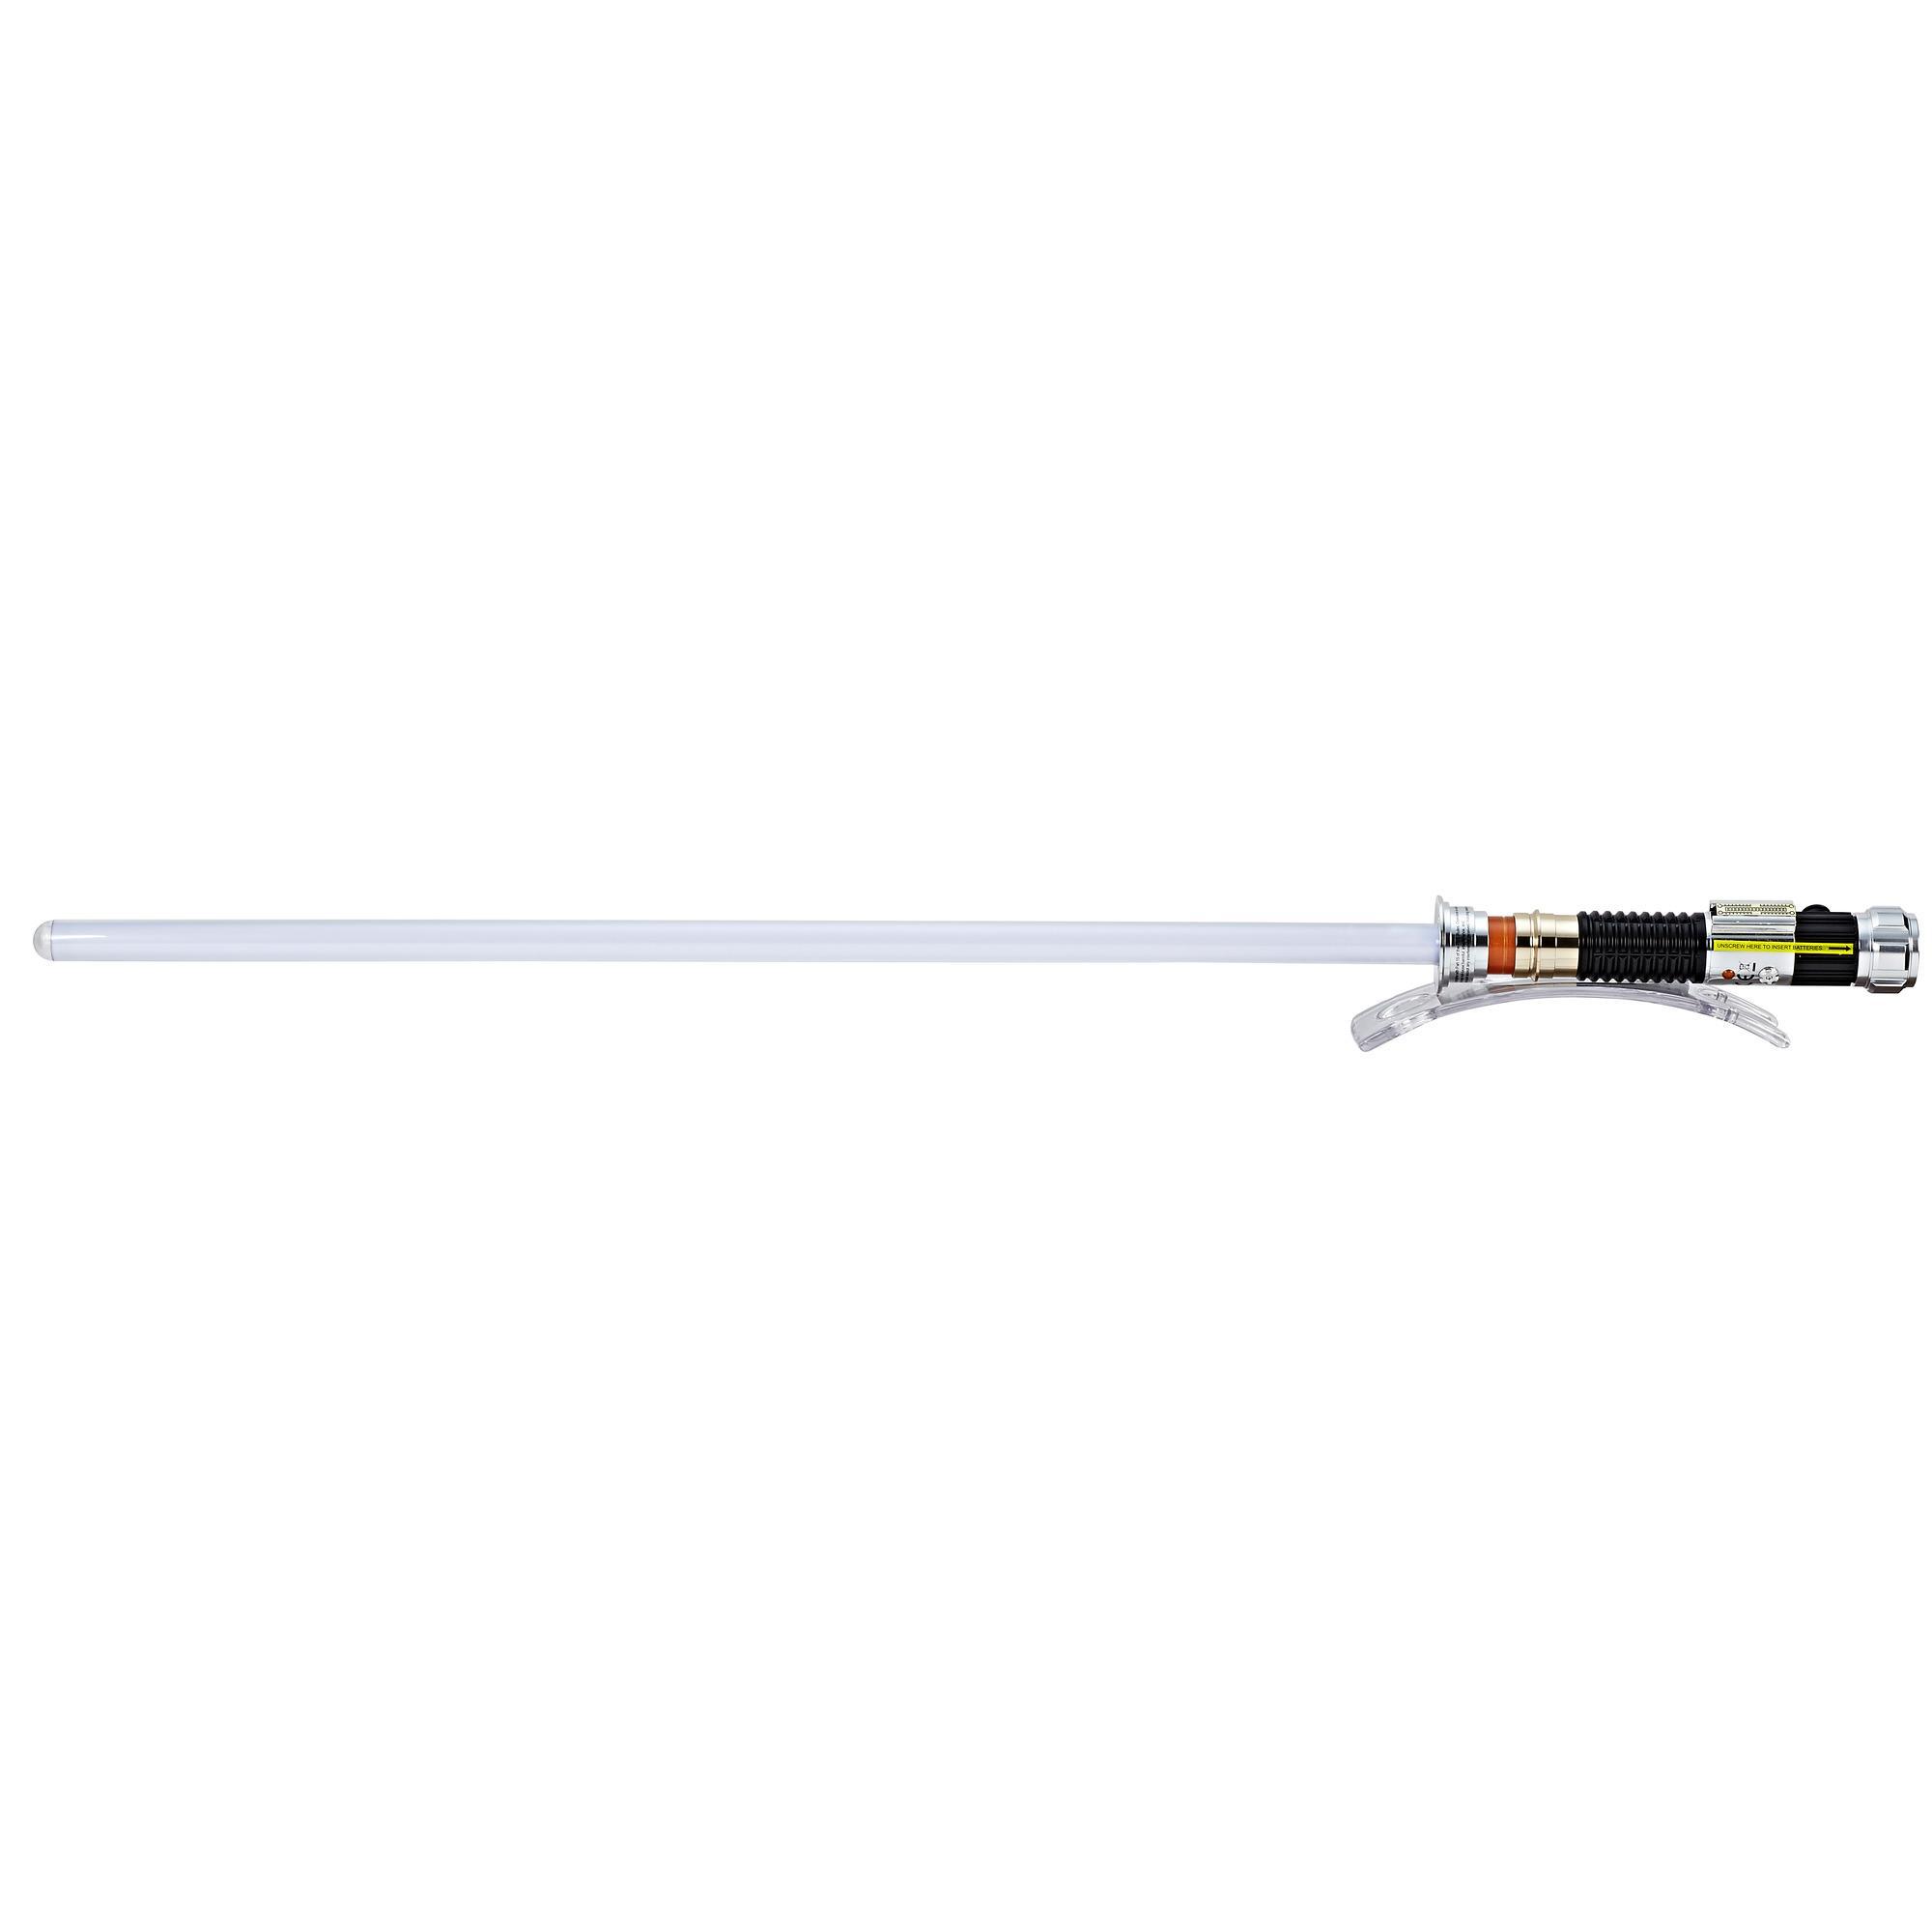 Star Wars: Episode IV The Black Series Obi-Wan Kenobi Force FX Lightsaber